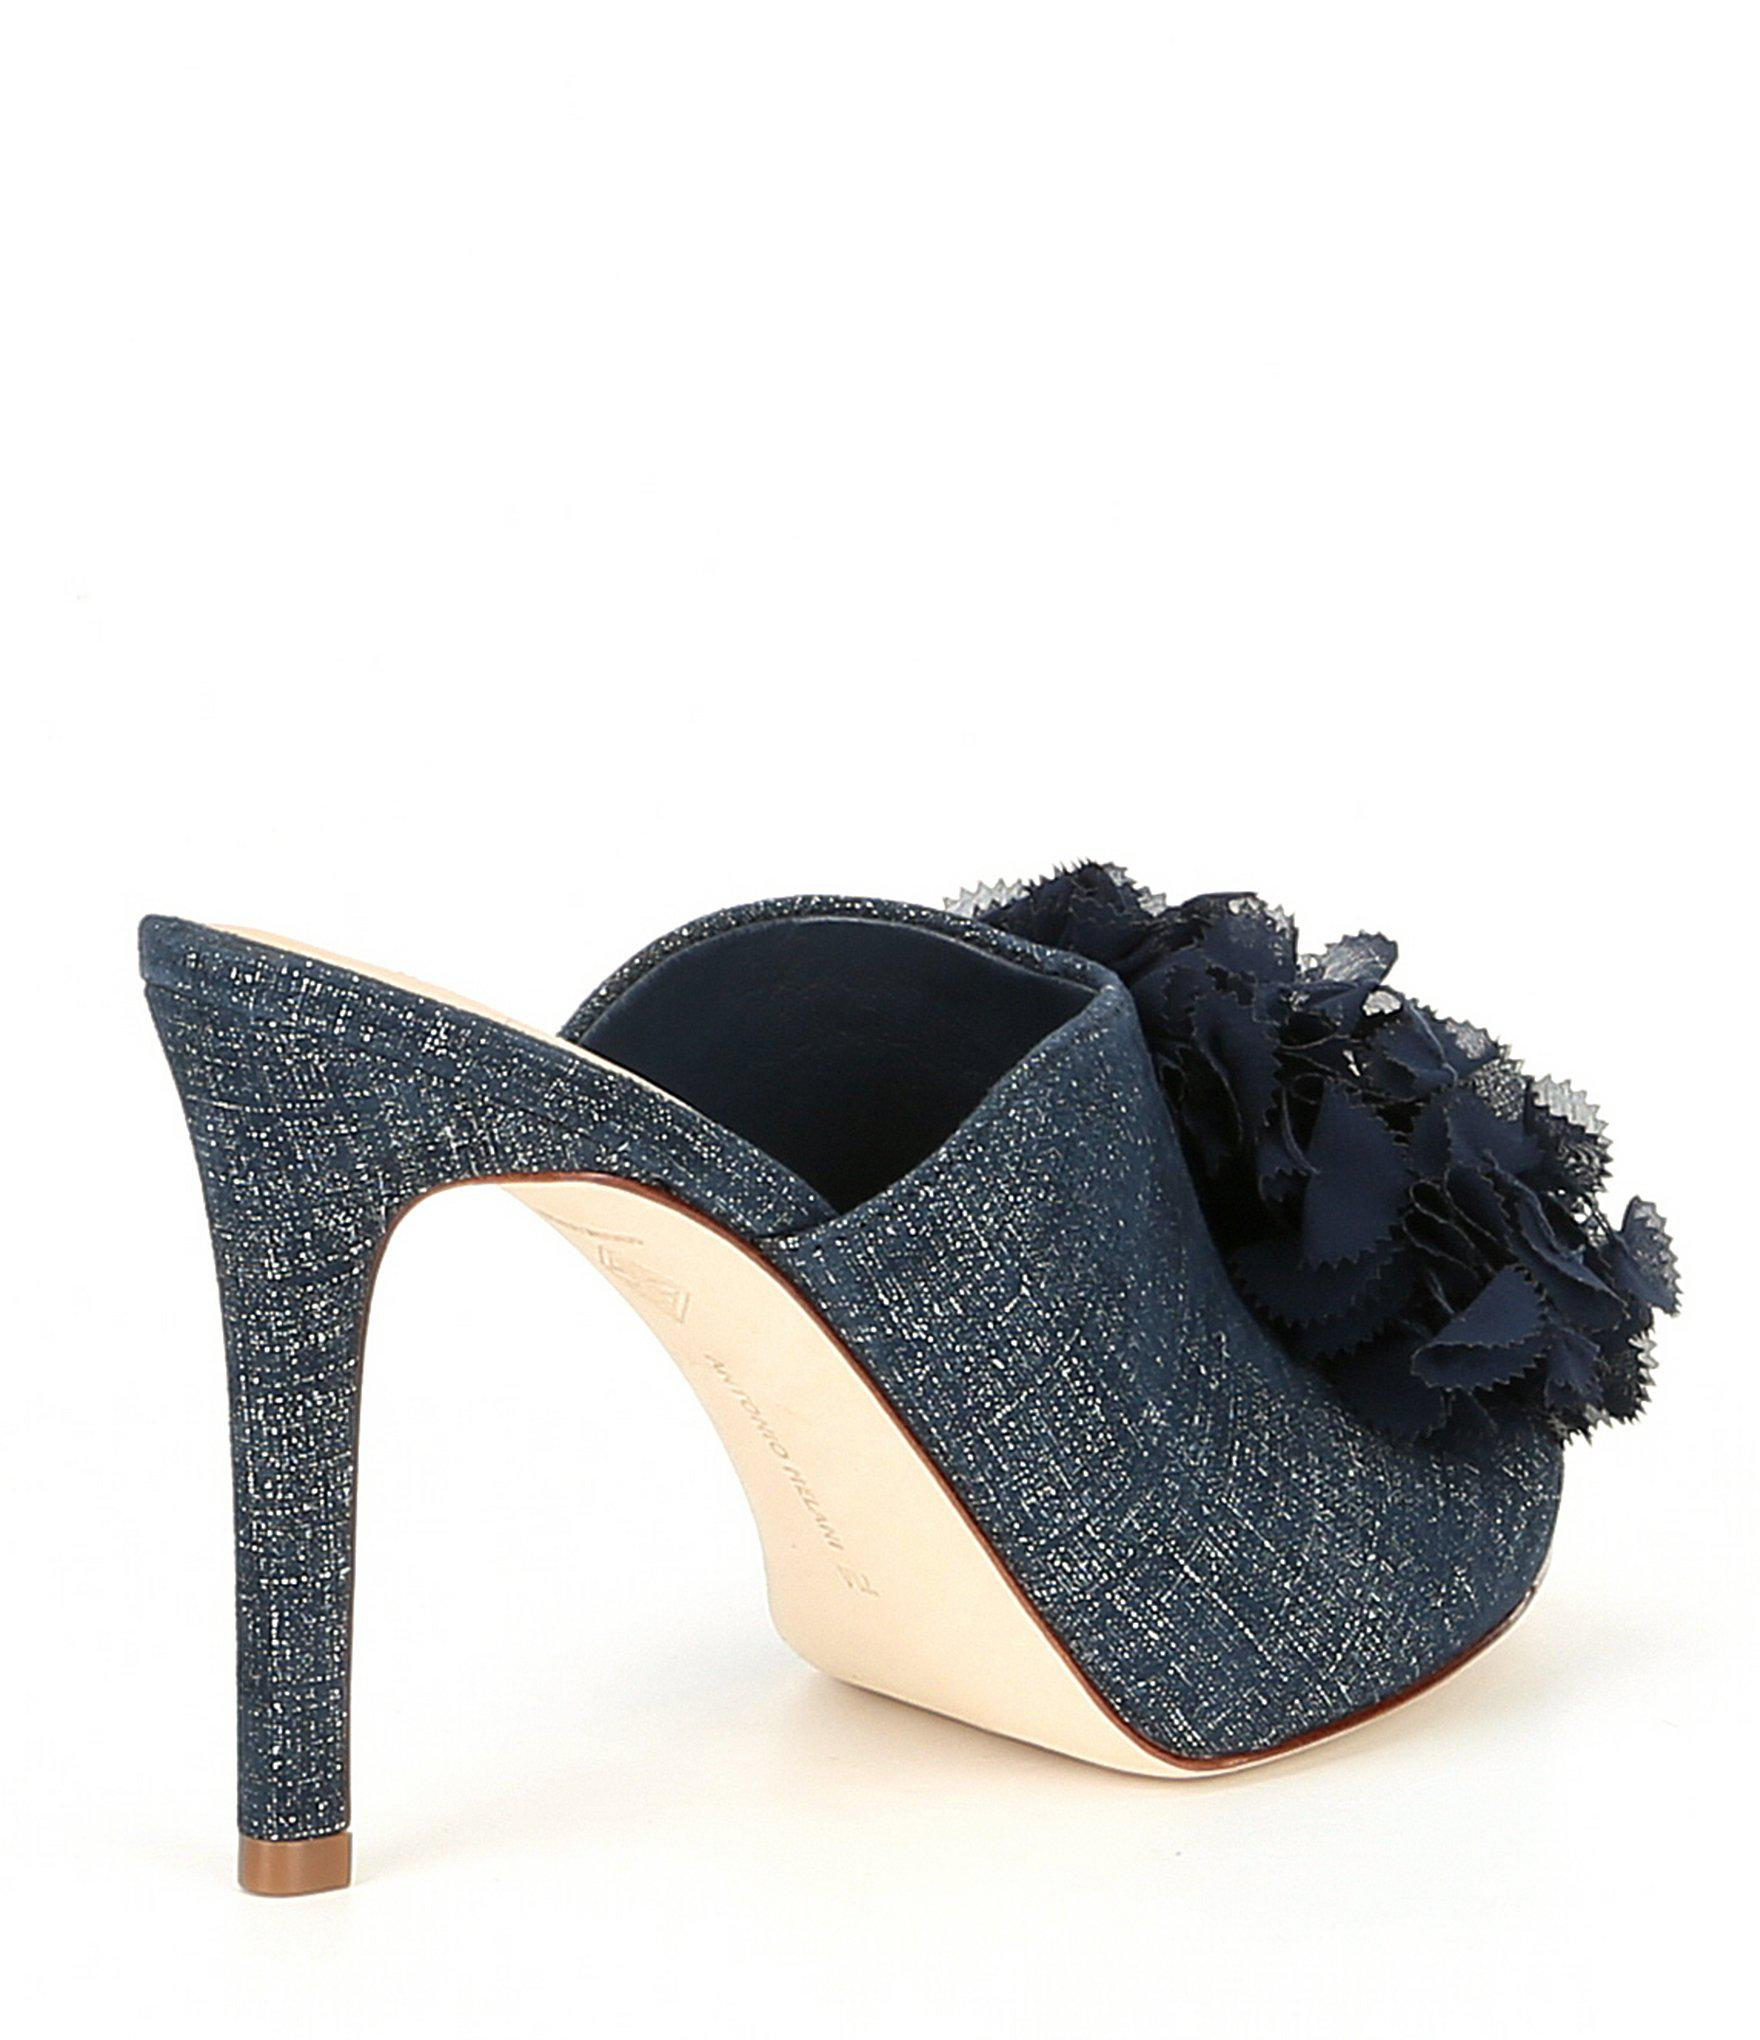 322de04f080 Antonio Melani - Blue Koribela Leather Dress Mules - Lyst. View fullscreen